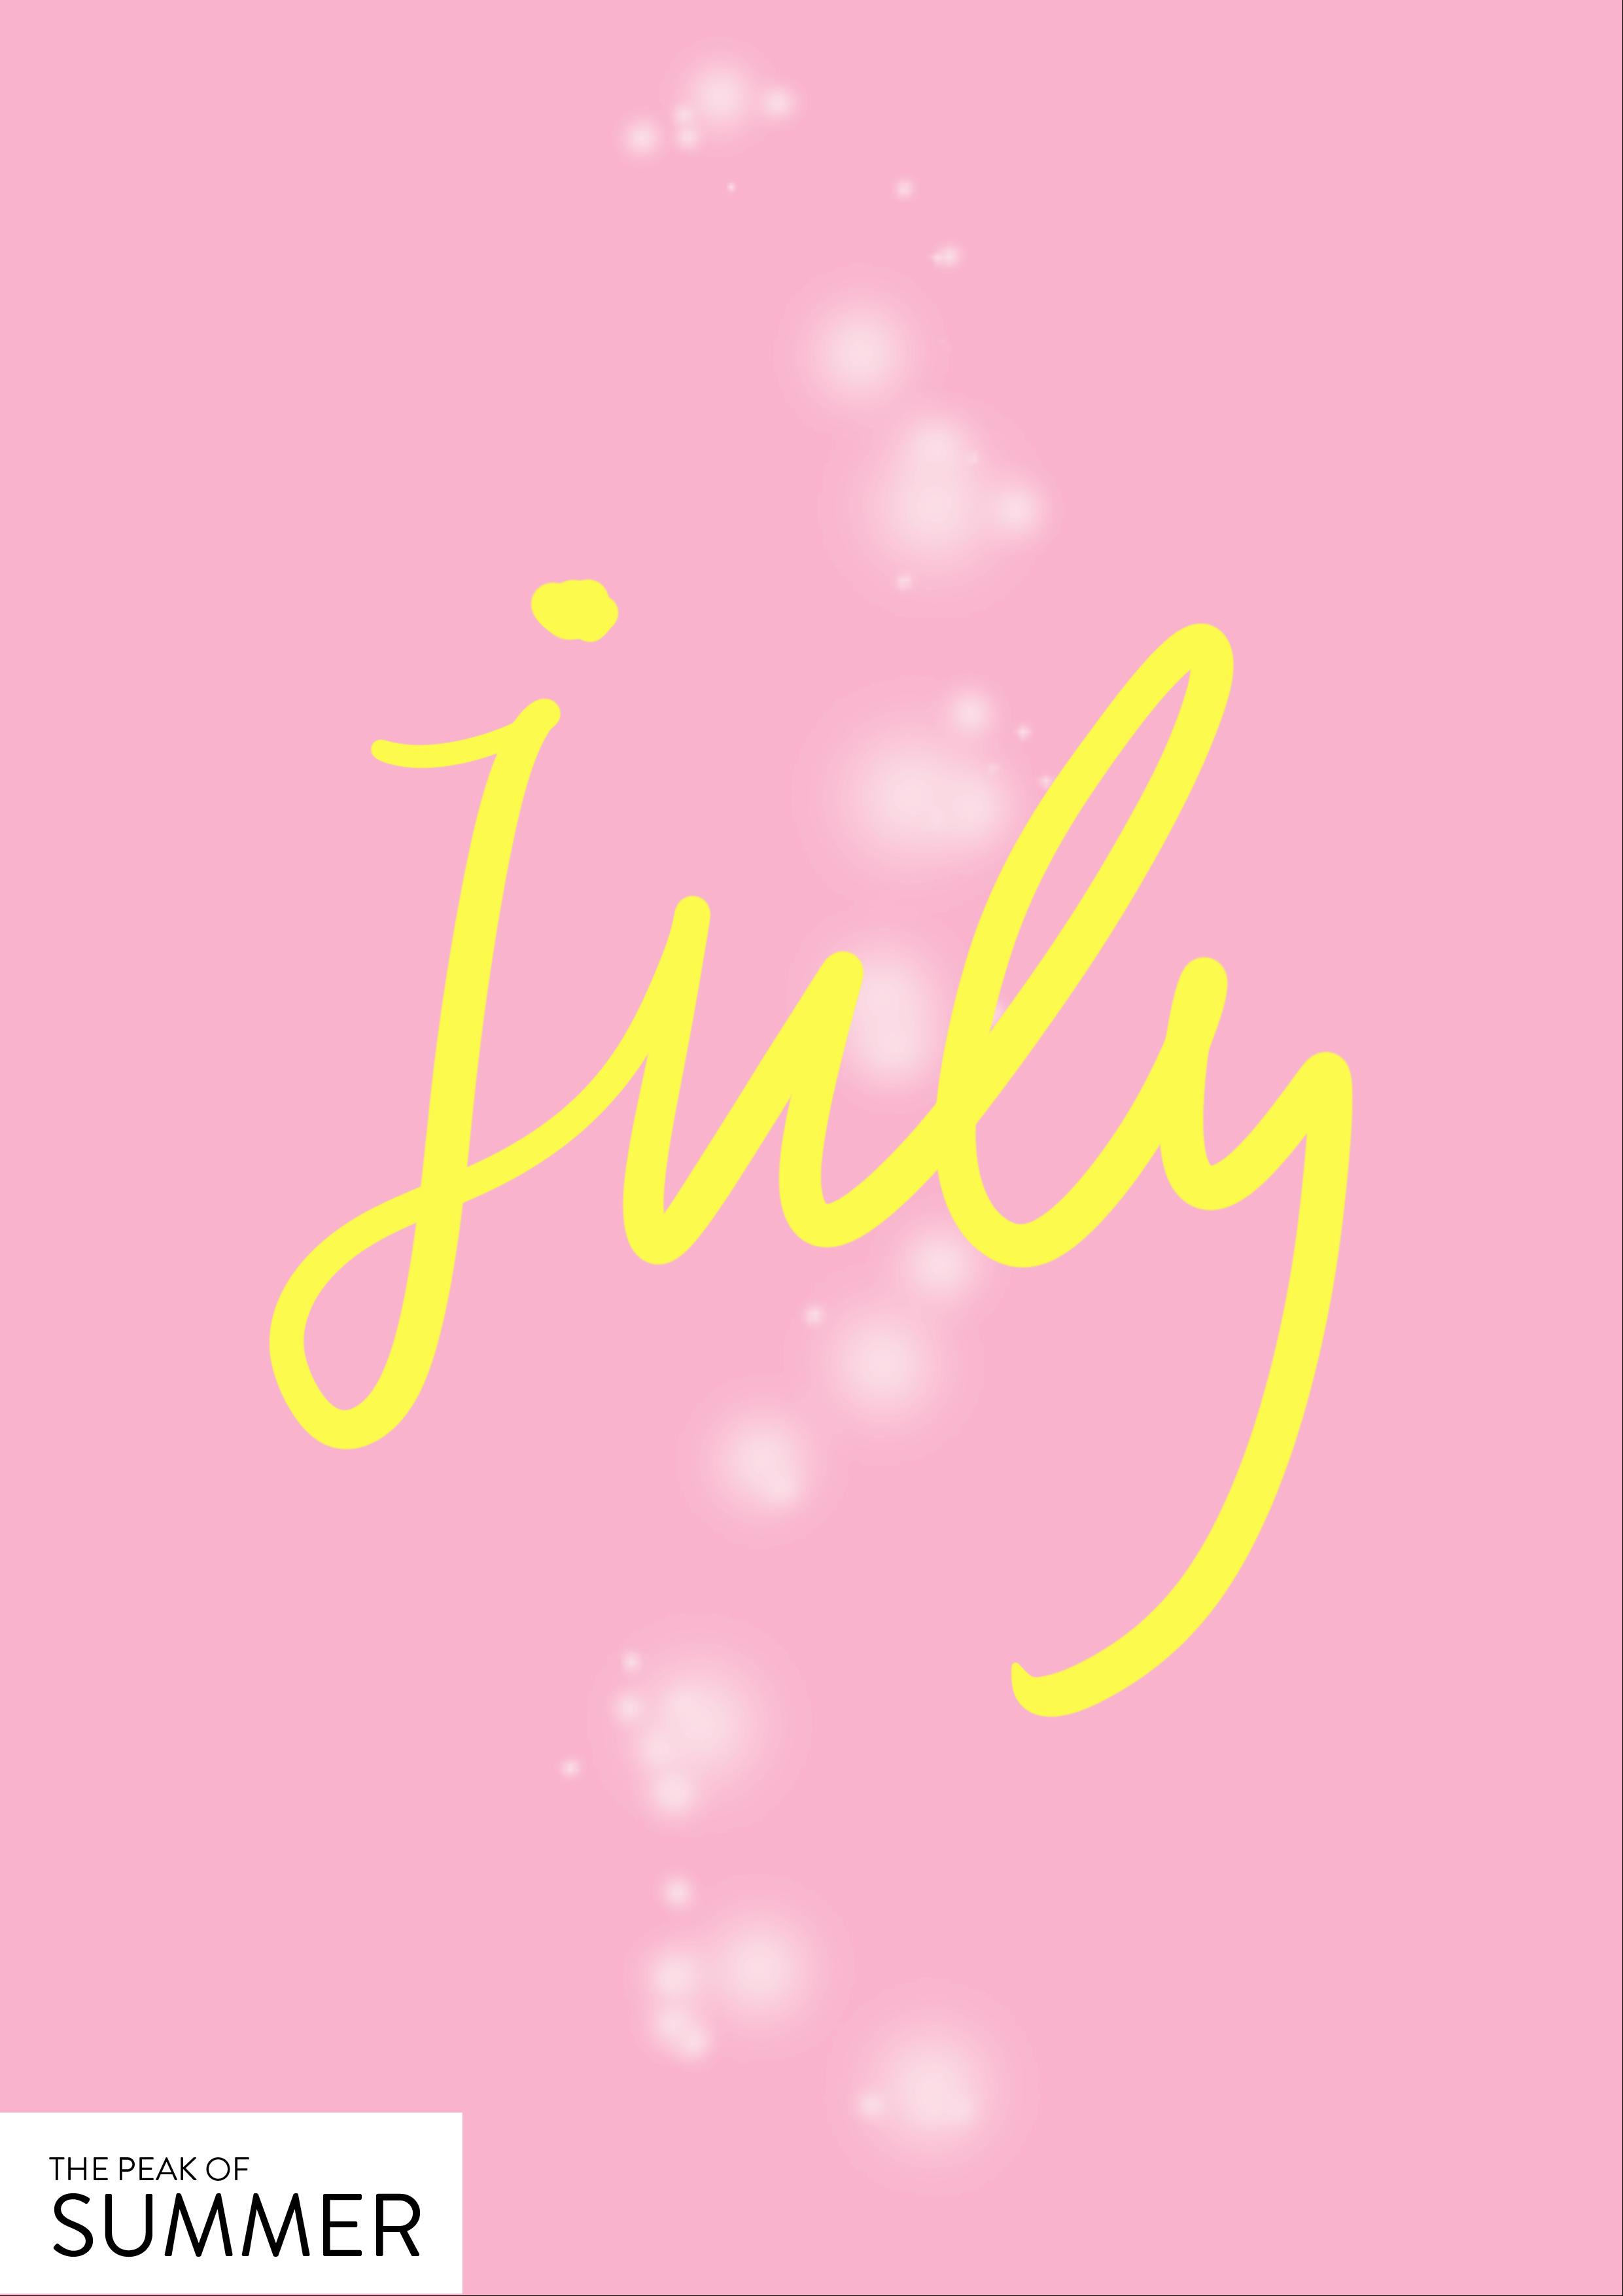 July - the peak of Summer // Phylleli Design Studio, Online-Shop and Self-Care Blog #design #graphicdesign #designstudio #lettering #branding #creativity #colorful #poster #layout #designer #graphicdesignblog #illustration #poster #summer #selfcare #selfcareblog #mentalhealth #selflove #selfrespect